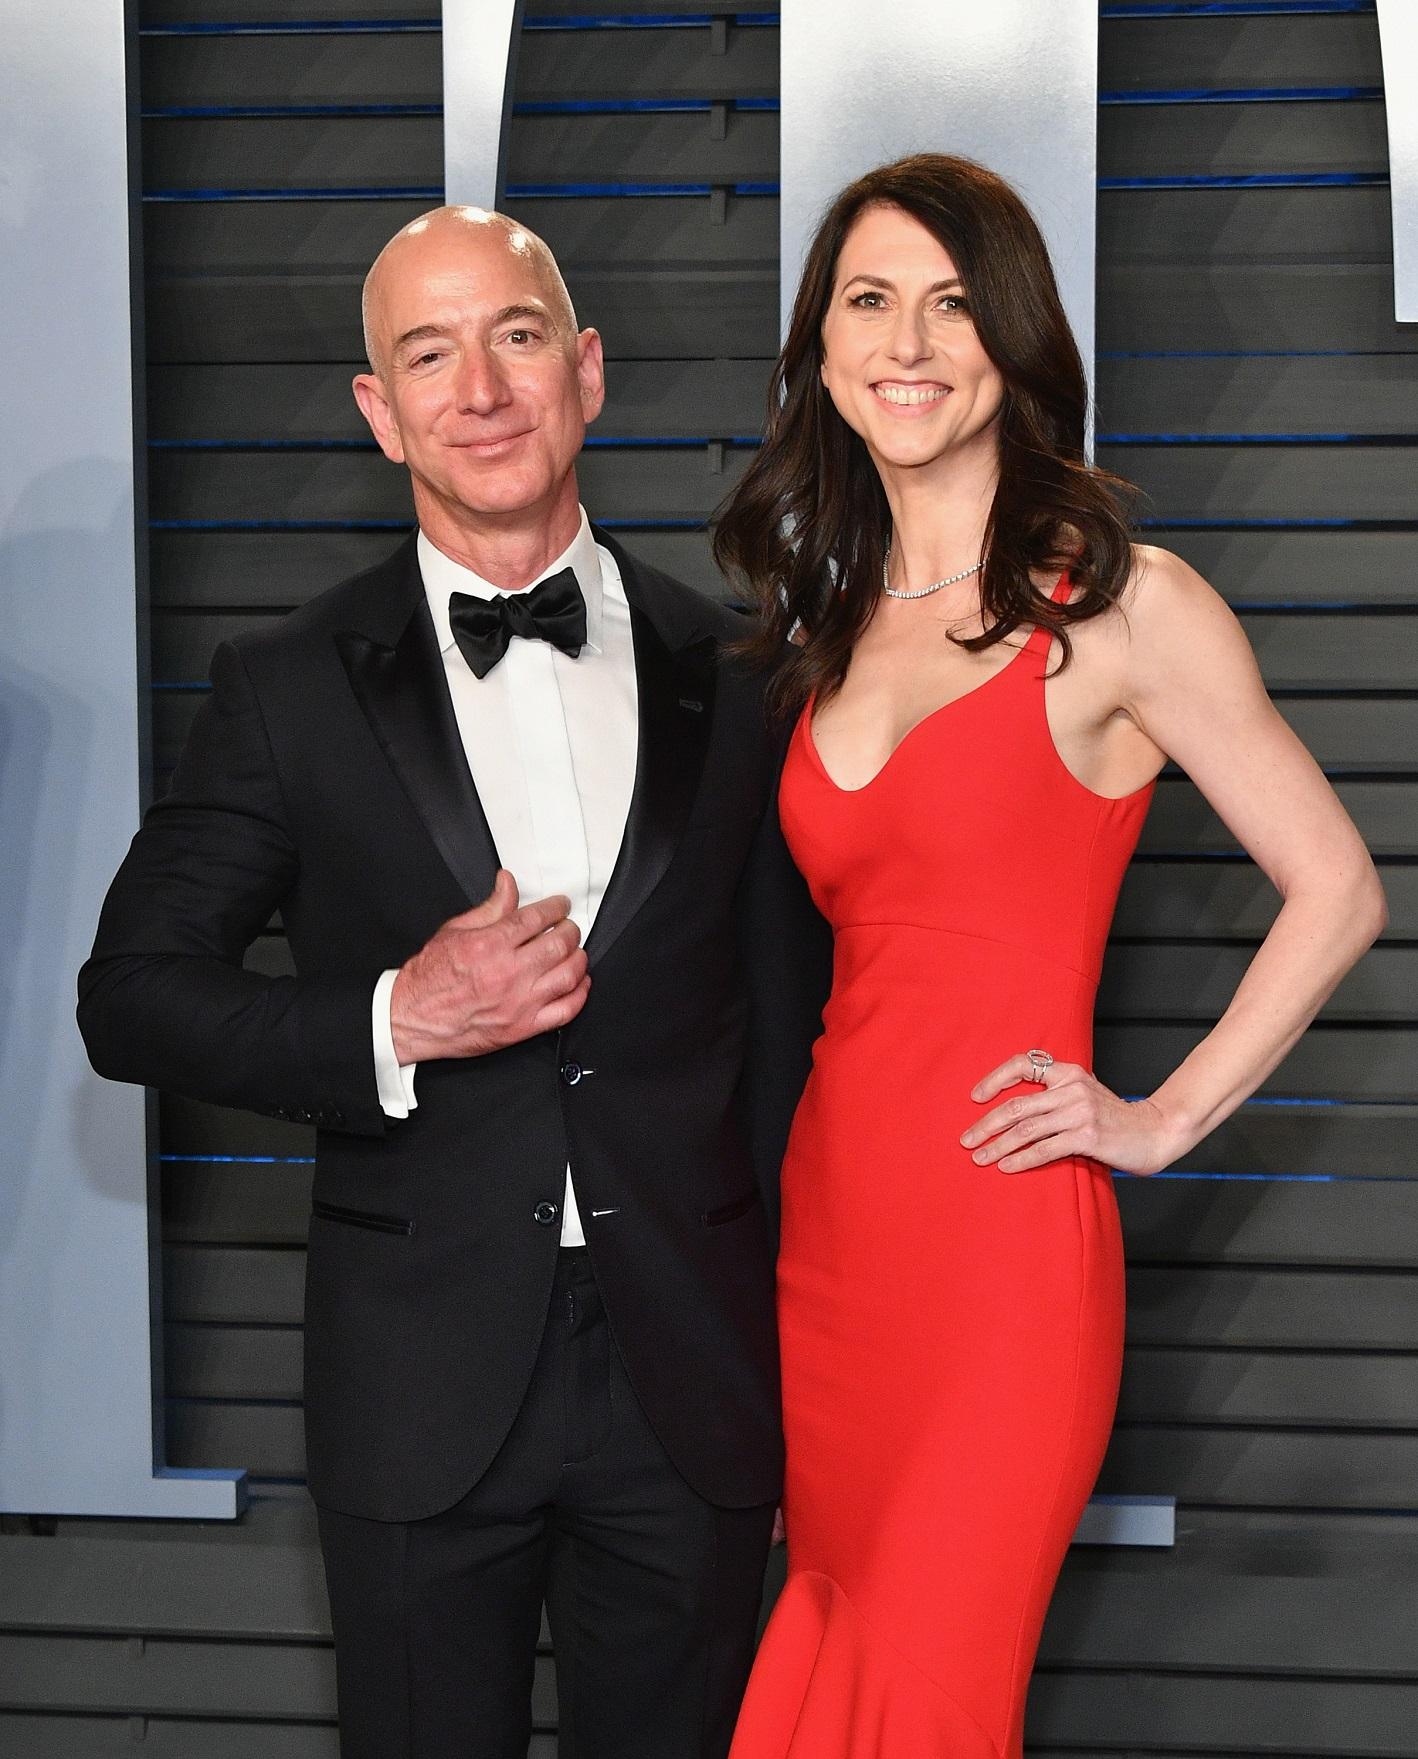 Richest People - Jeff Bezos and MacKenzie Bezos